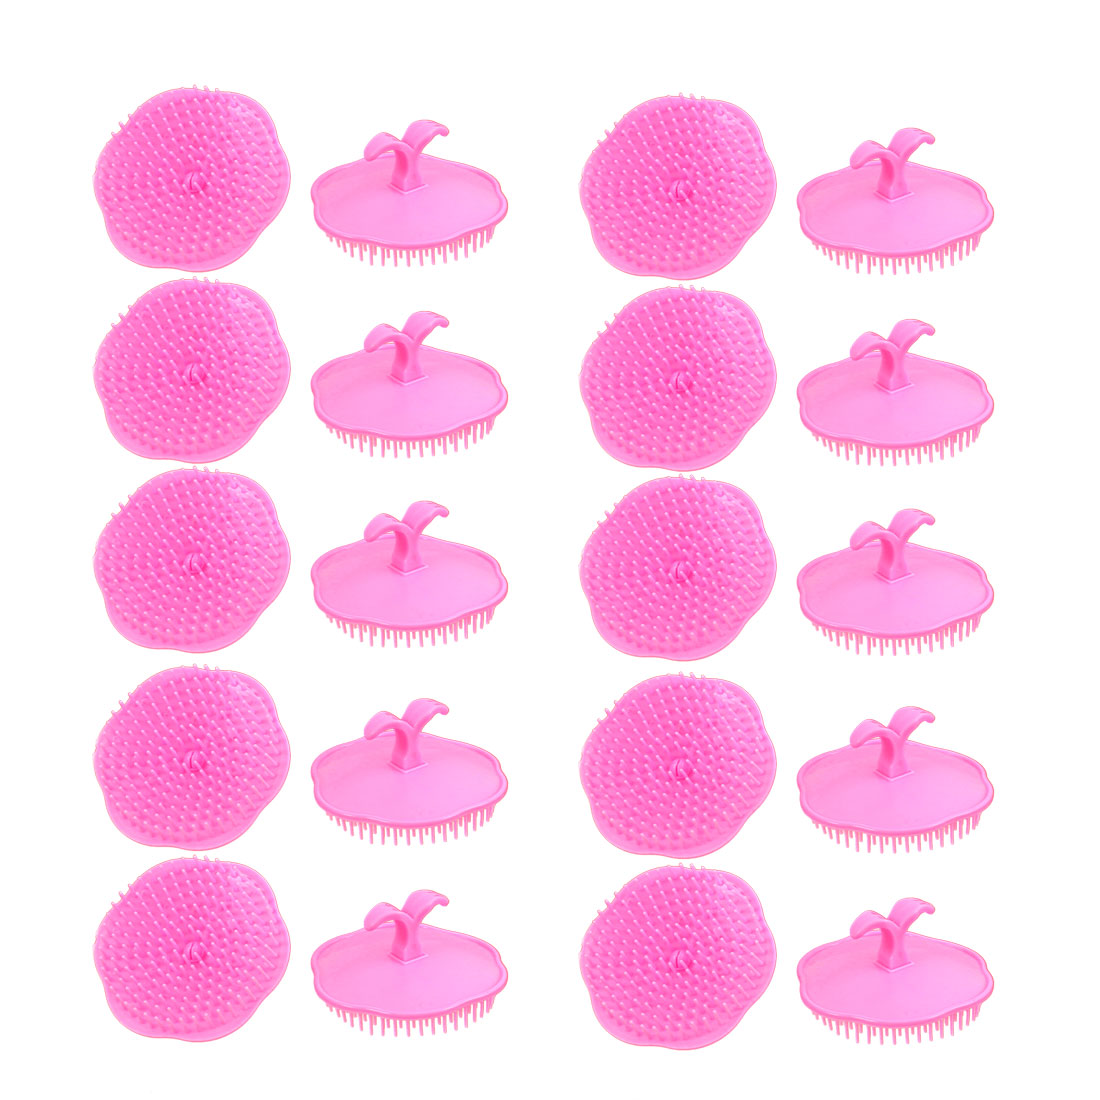 Shampoo Scalp Head Conditioner Massage Comb Hair Brush Pink 20Pcs